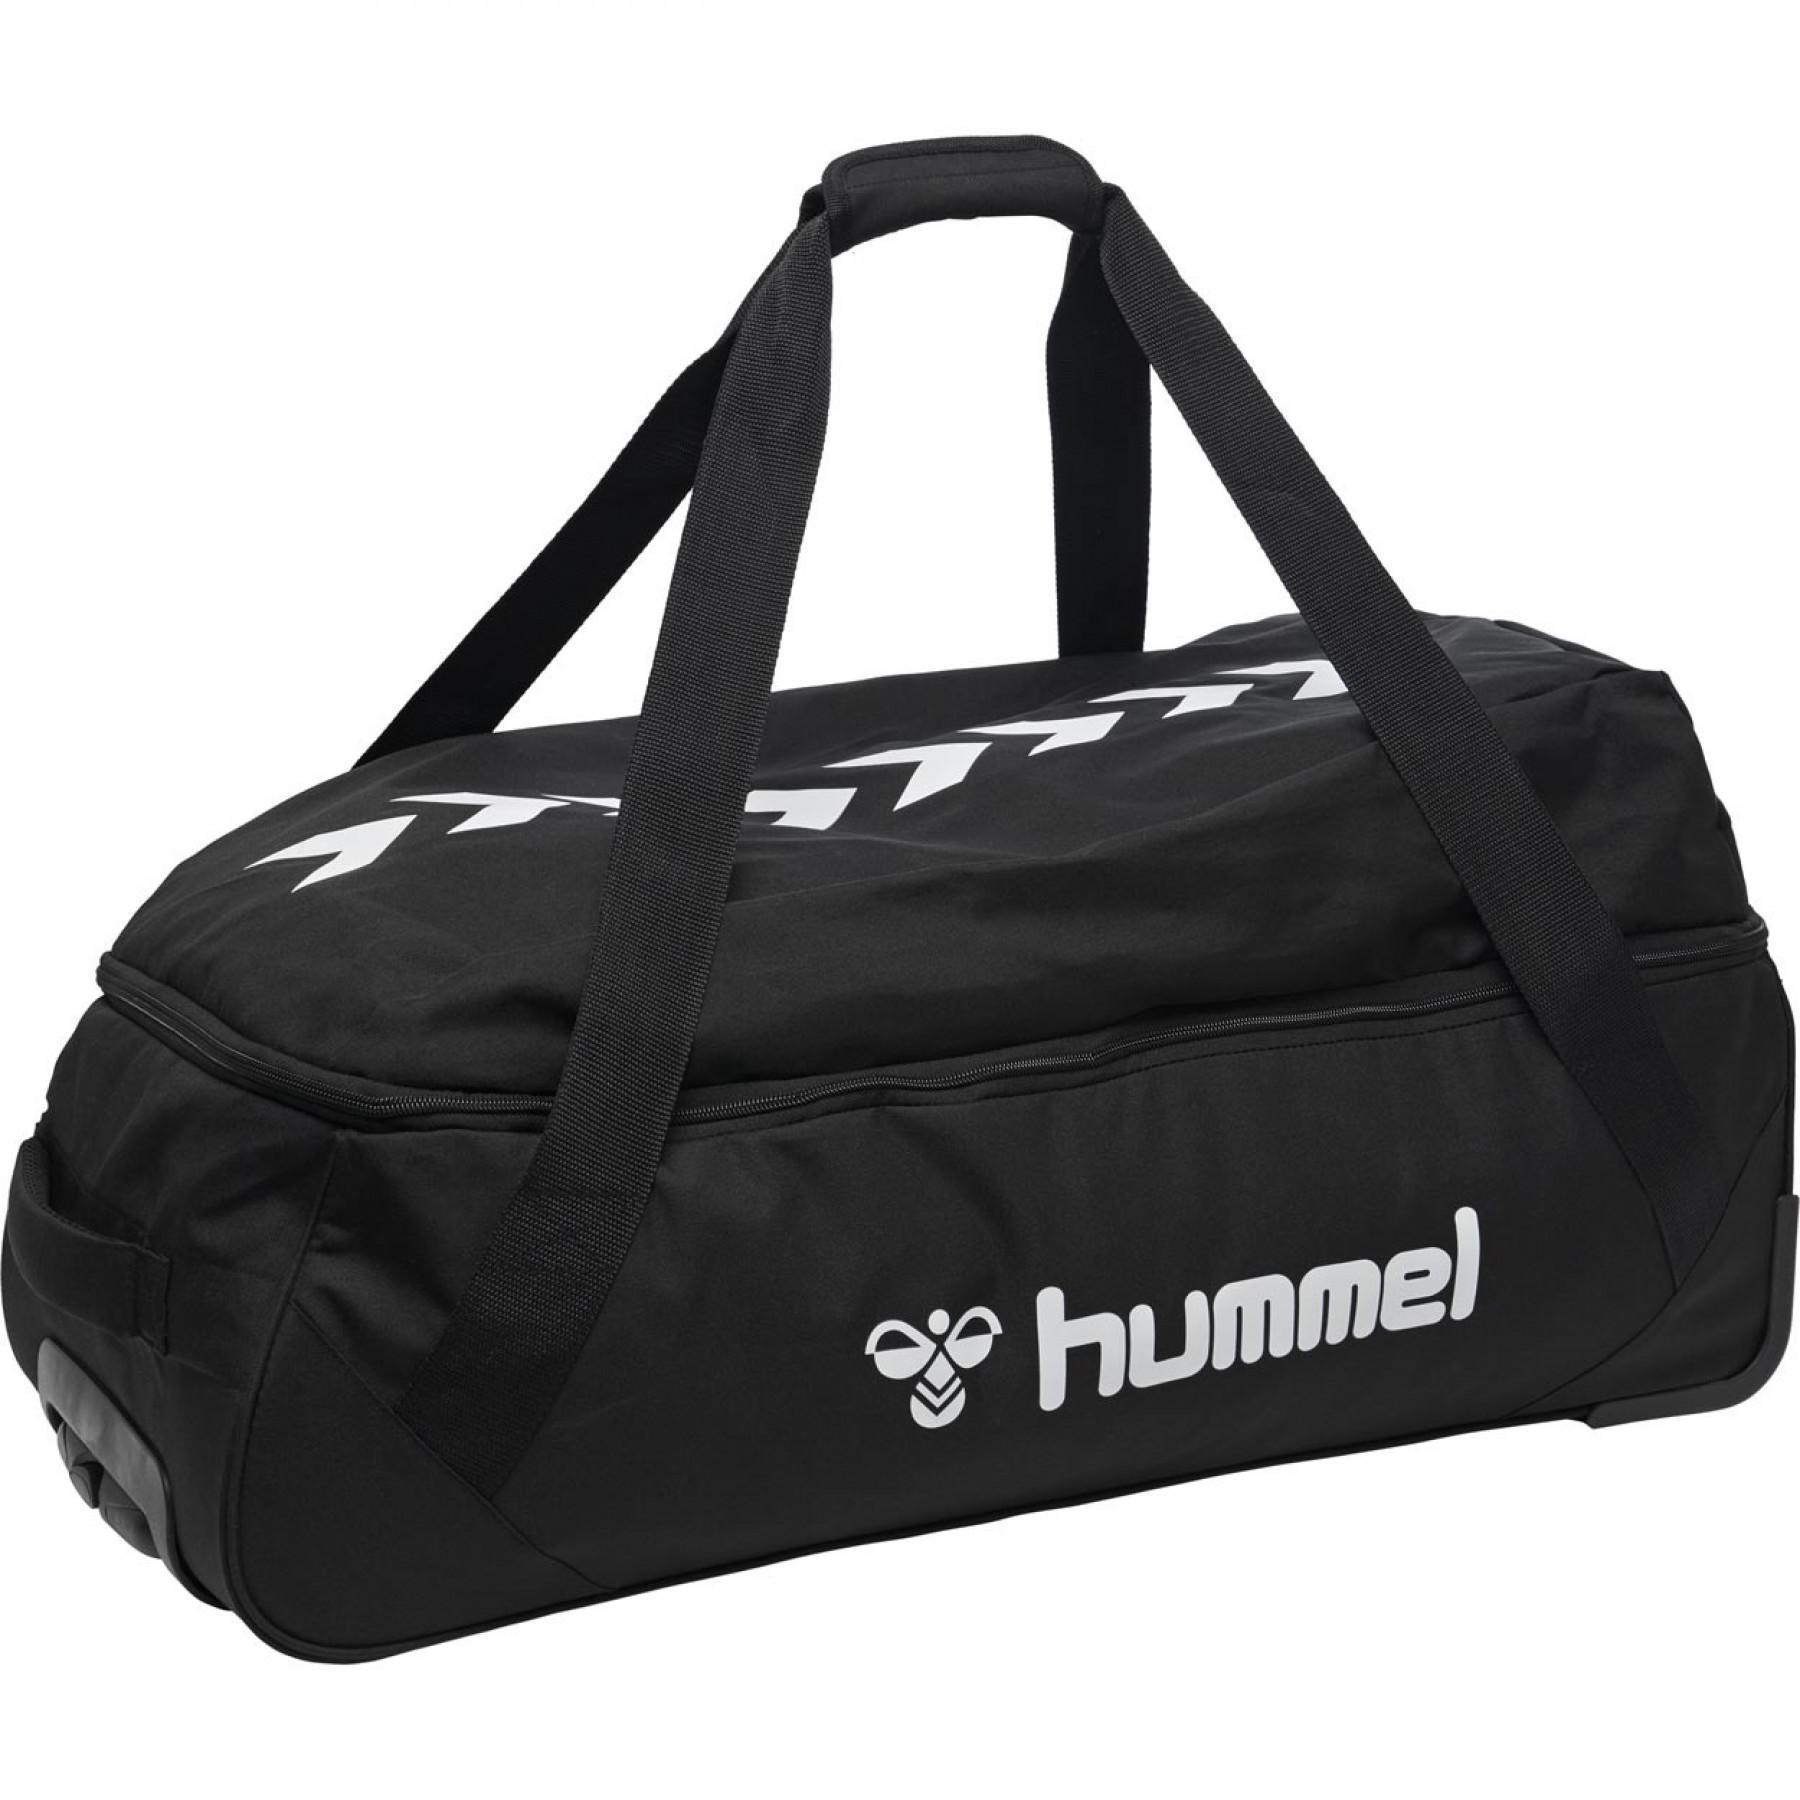 Sports bag Hummel Trolley